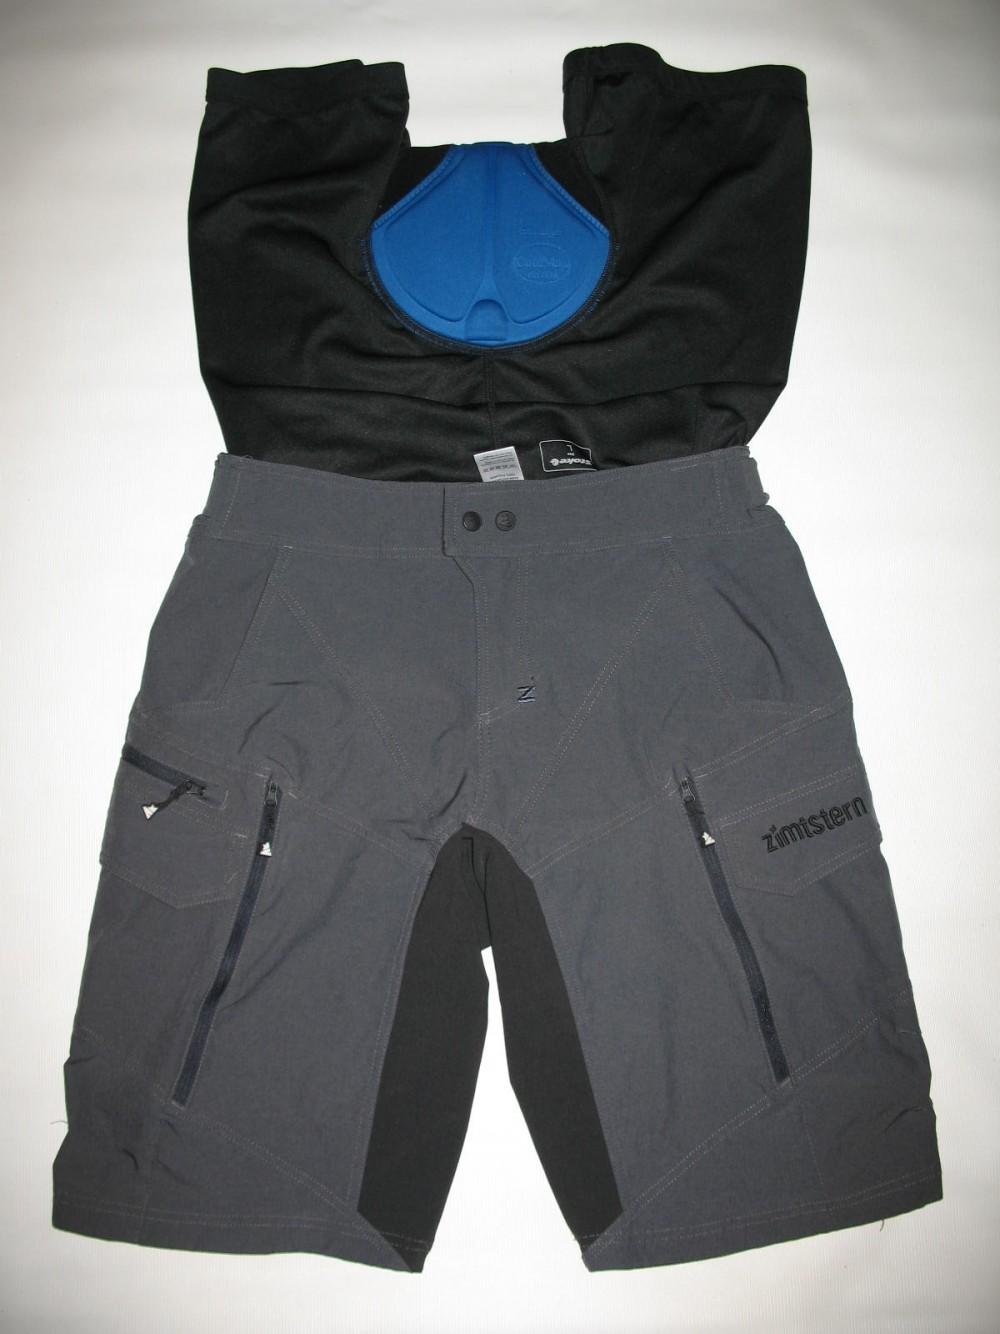 Велошорты ZIMTSTERN trailstar bike shorts (размер L) - 6